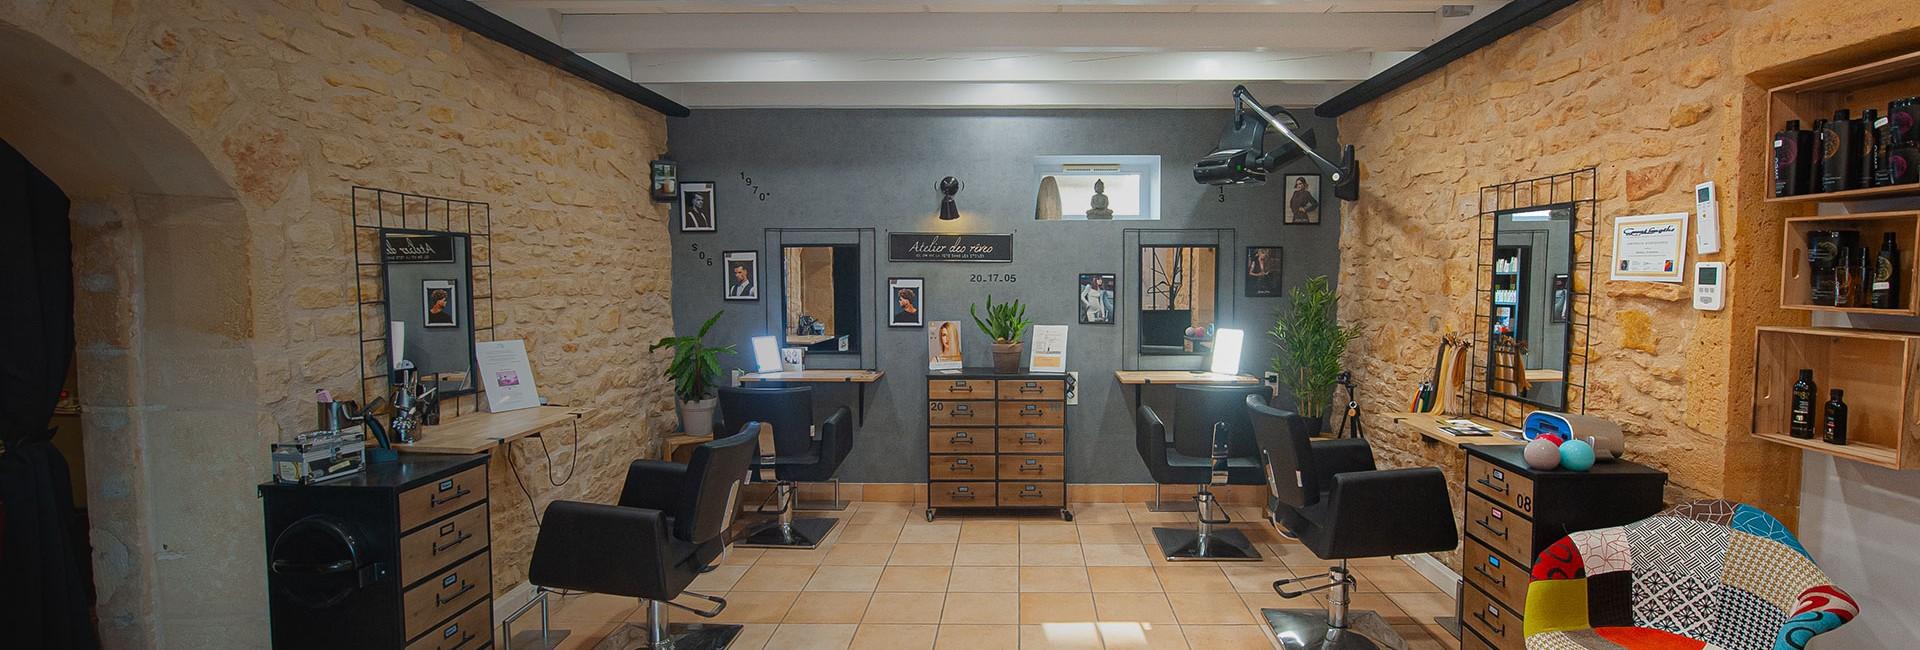 salon de coiffure a pouilly le monial